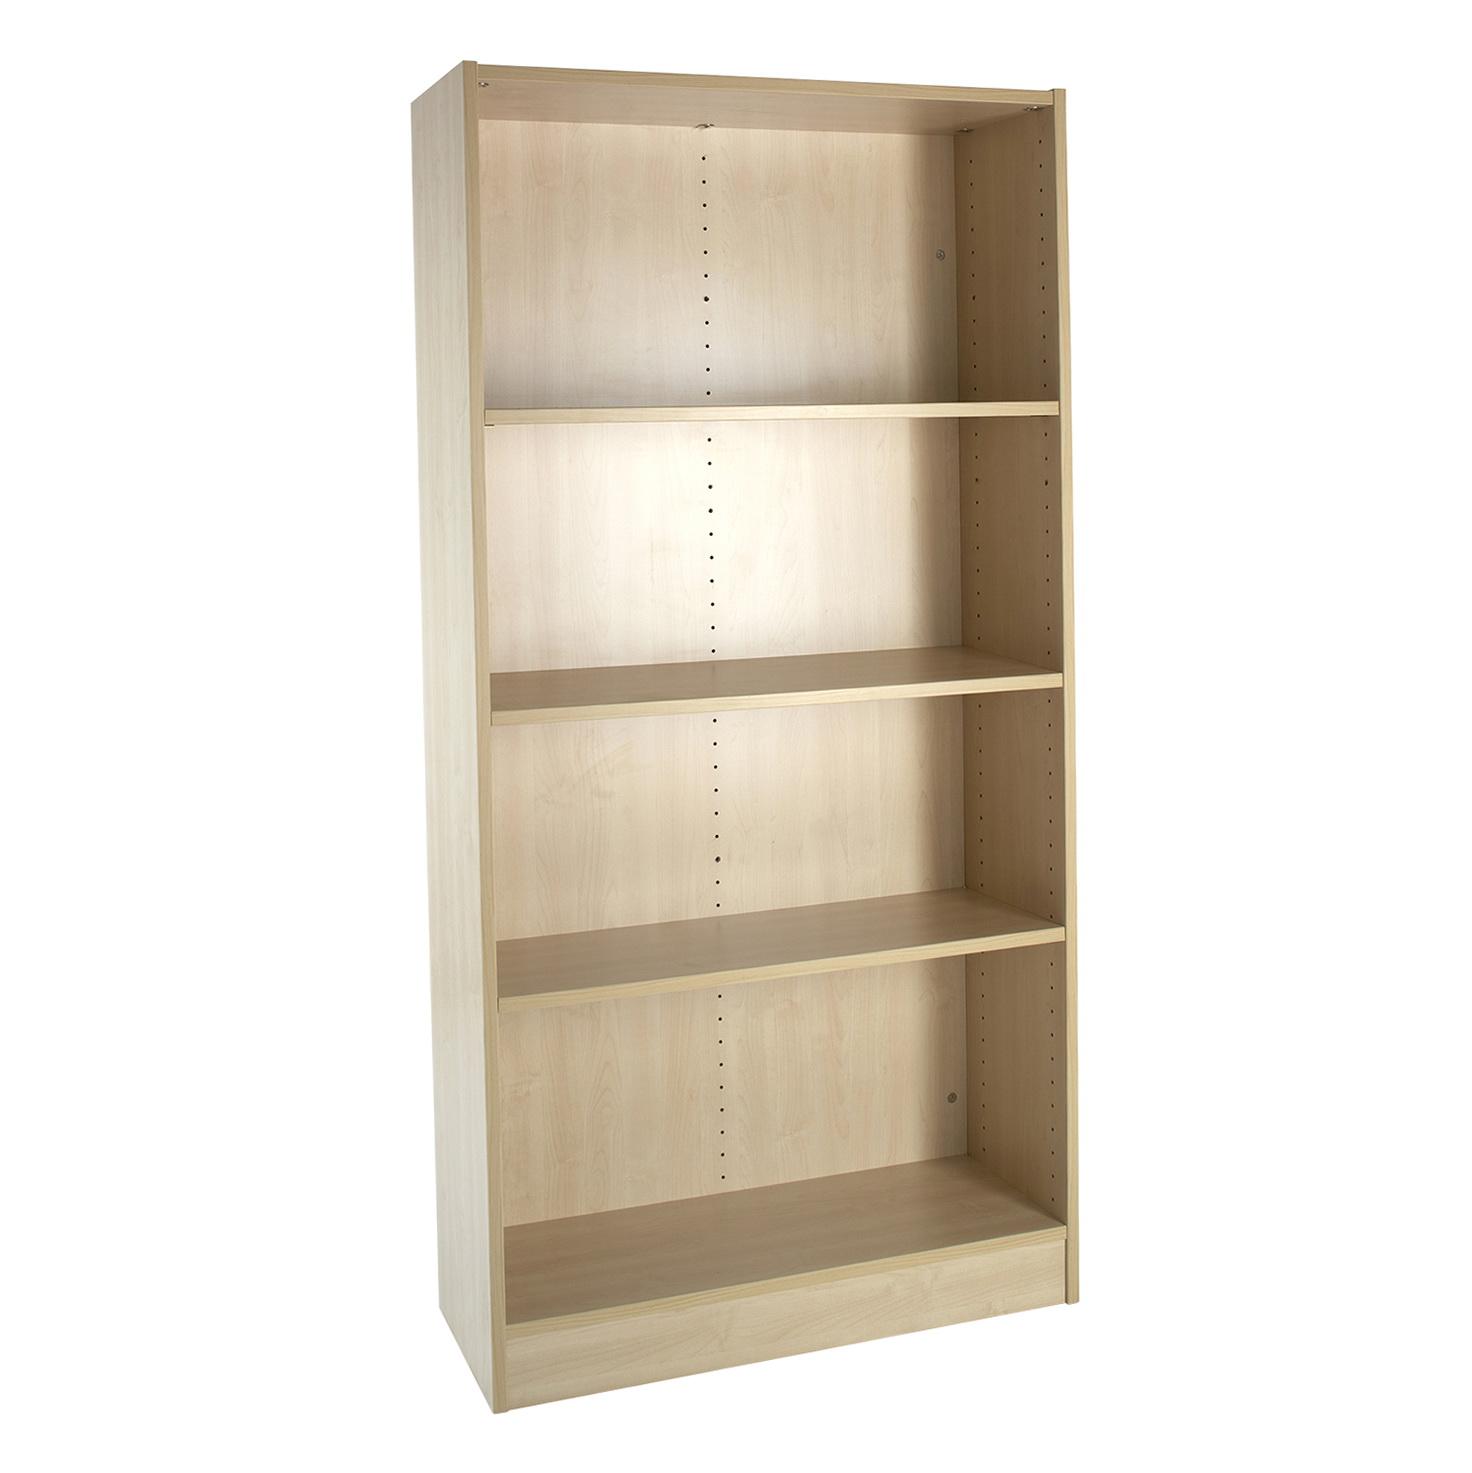 4 Shelf Bookcase Walmart